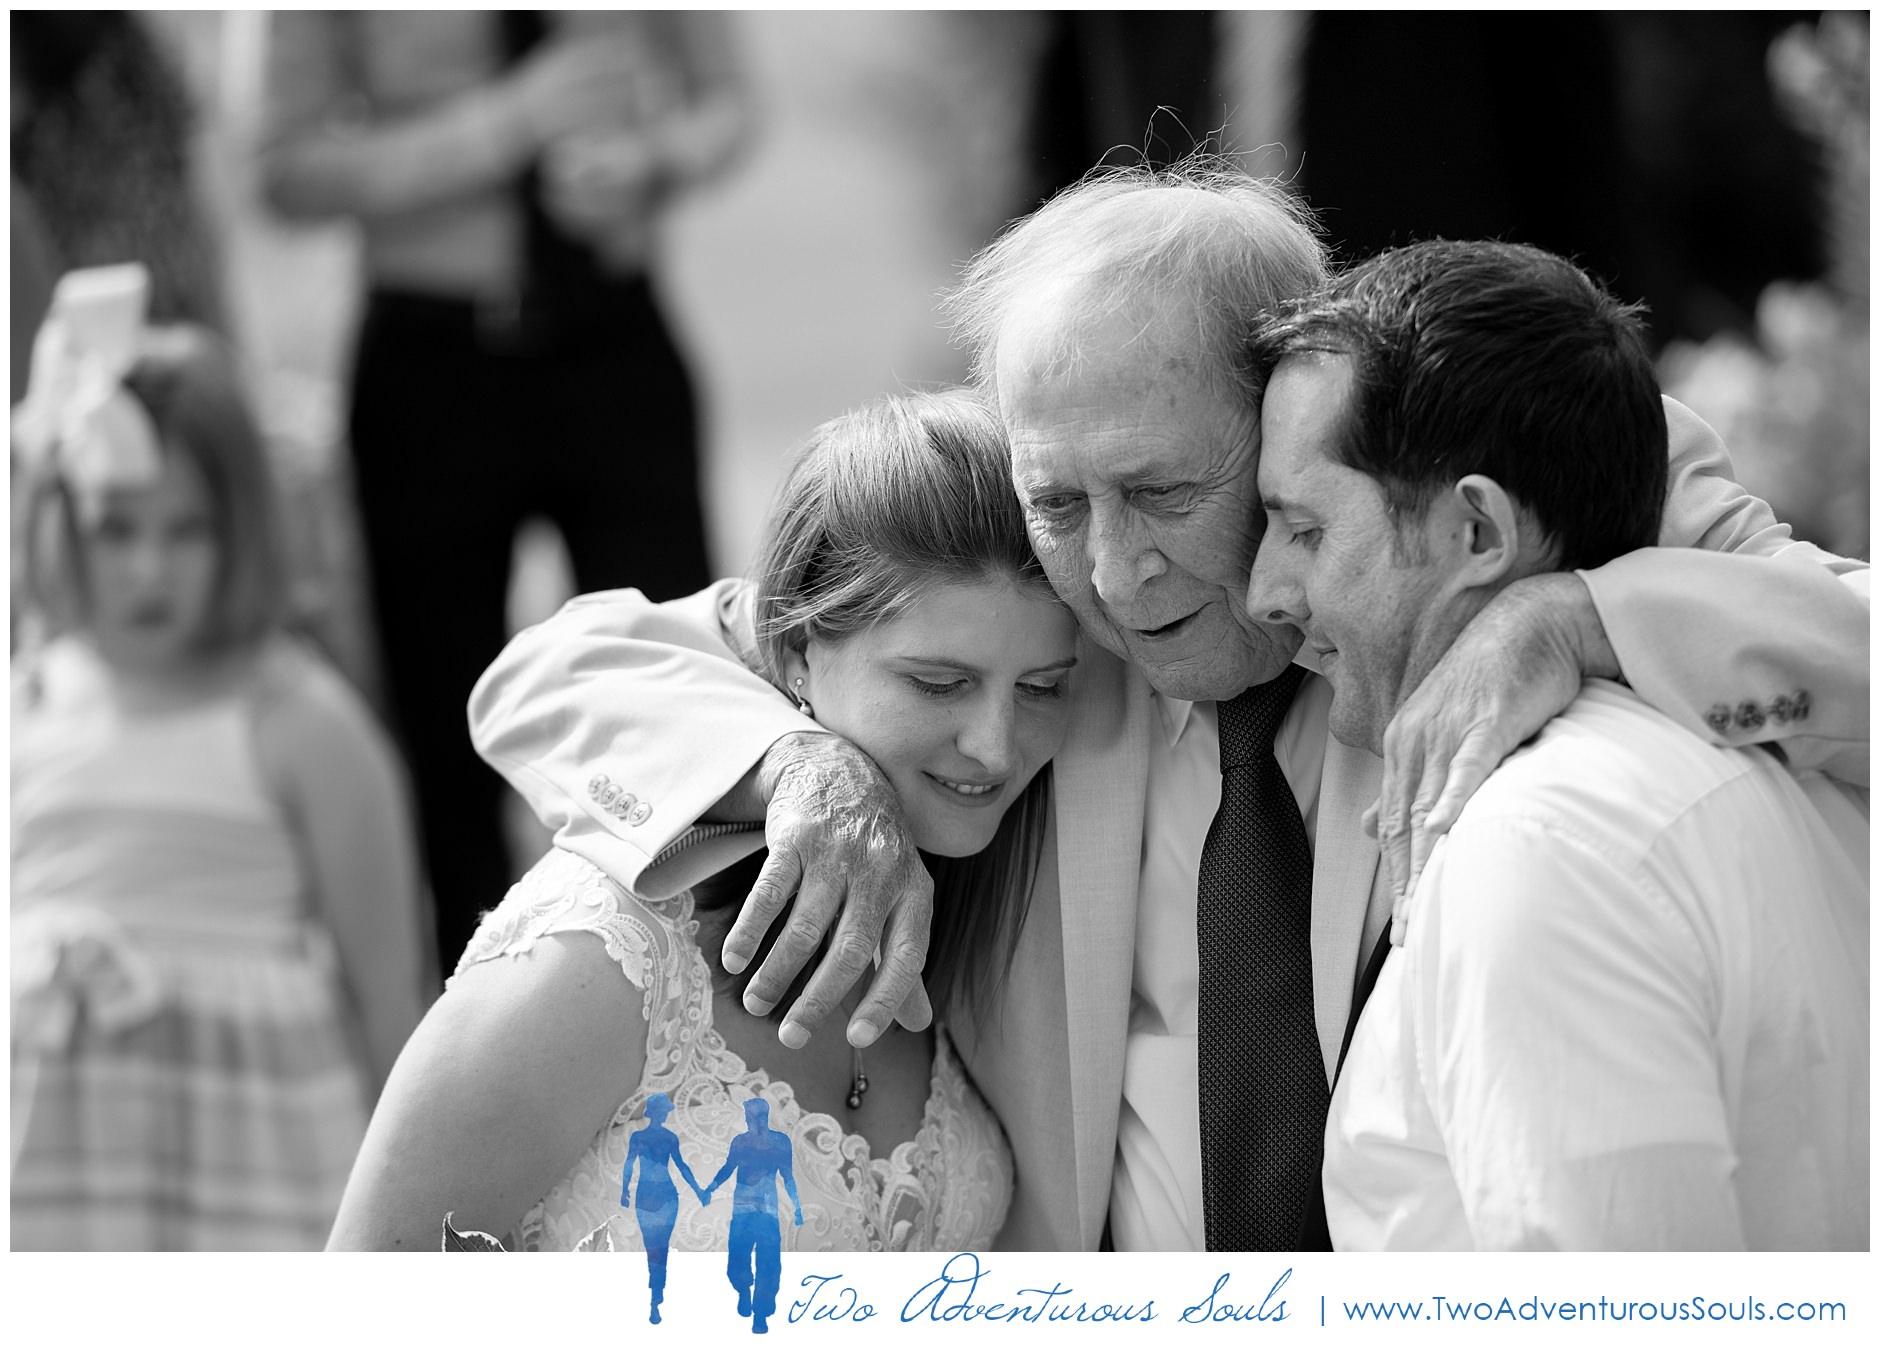 Chebeague Island Inn Wedding Photograpehrs, Maine Wedding Photographers, Two Adventurous Souls-082419_0009.jpg